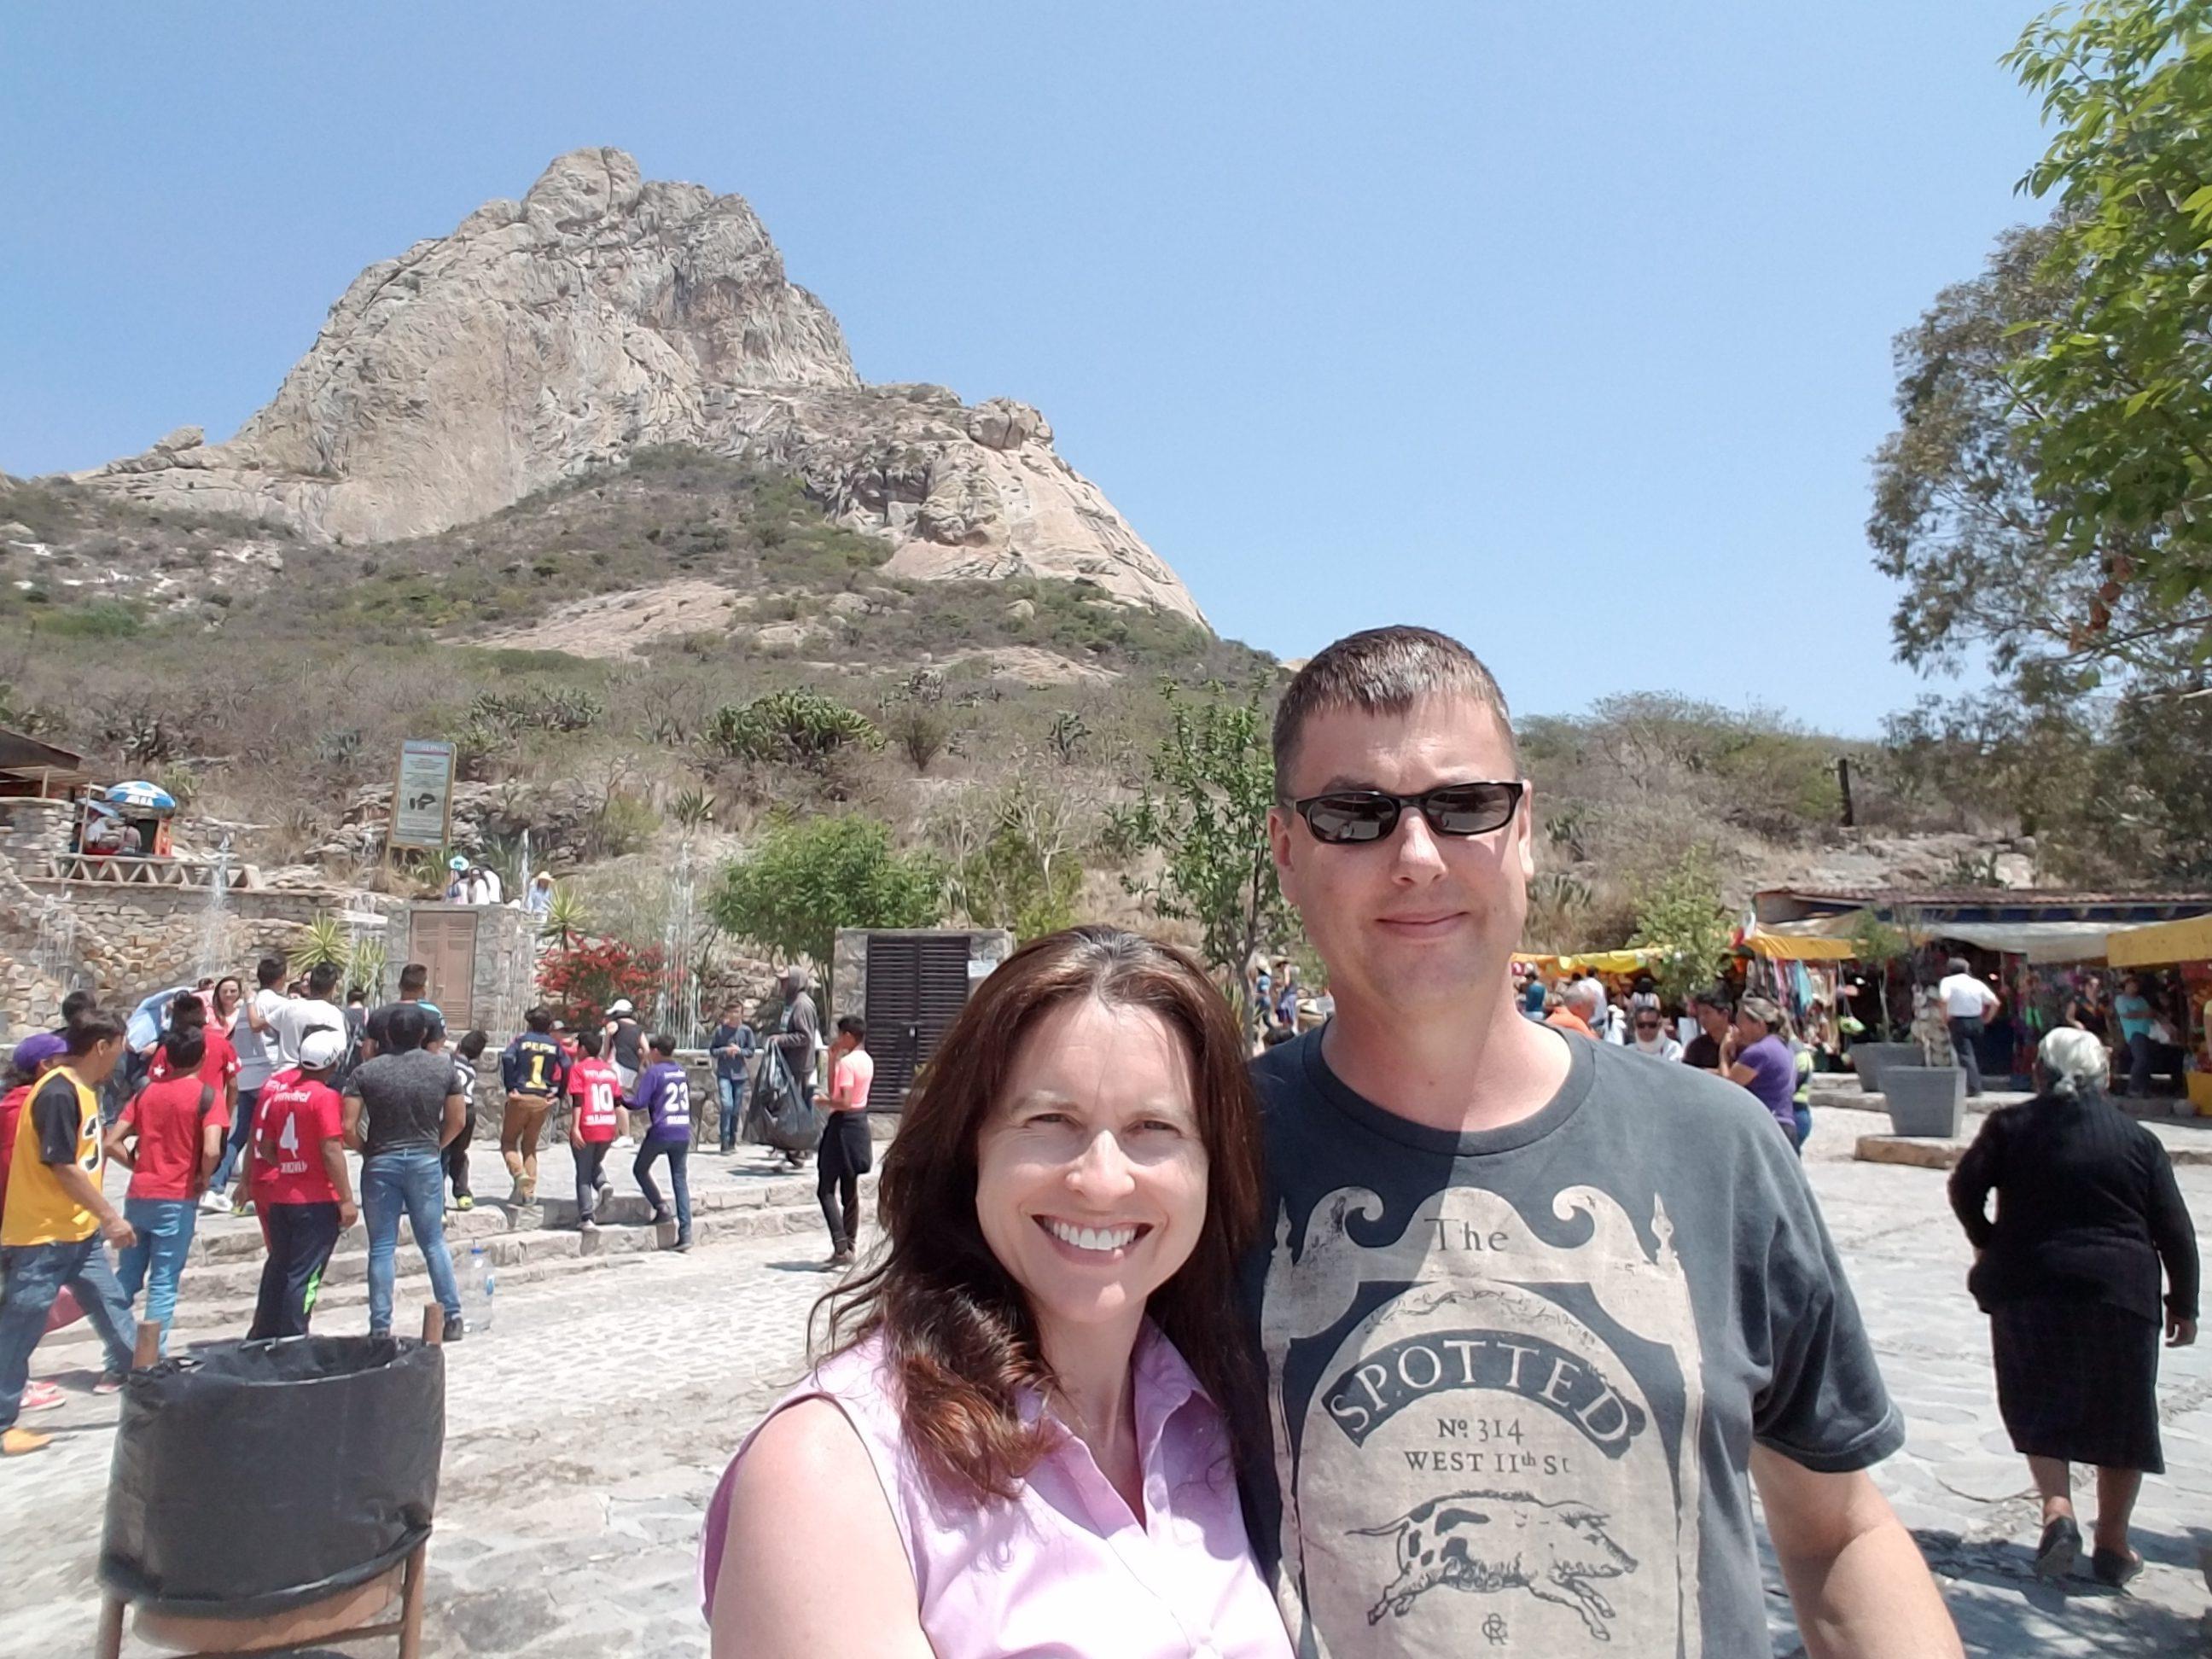 Tiffany and Tom at the base of Pena Bernal